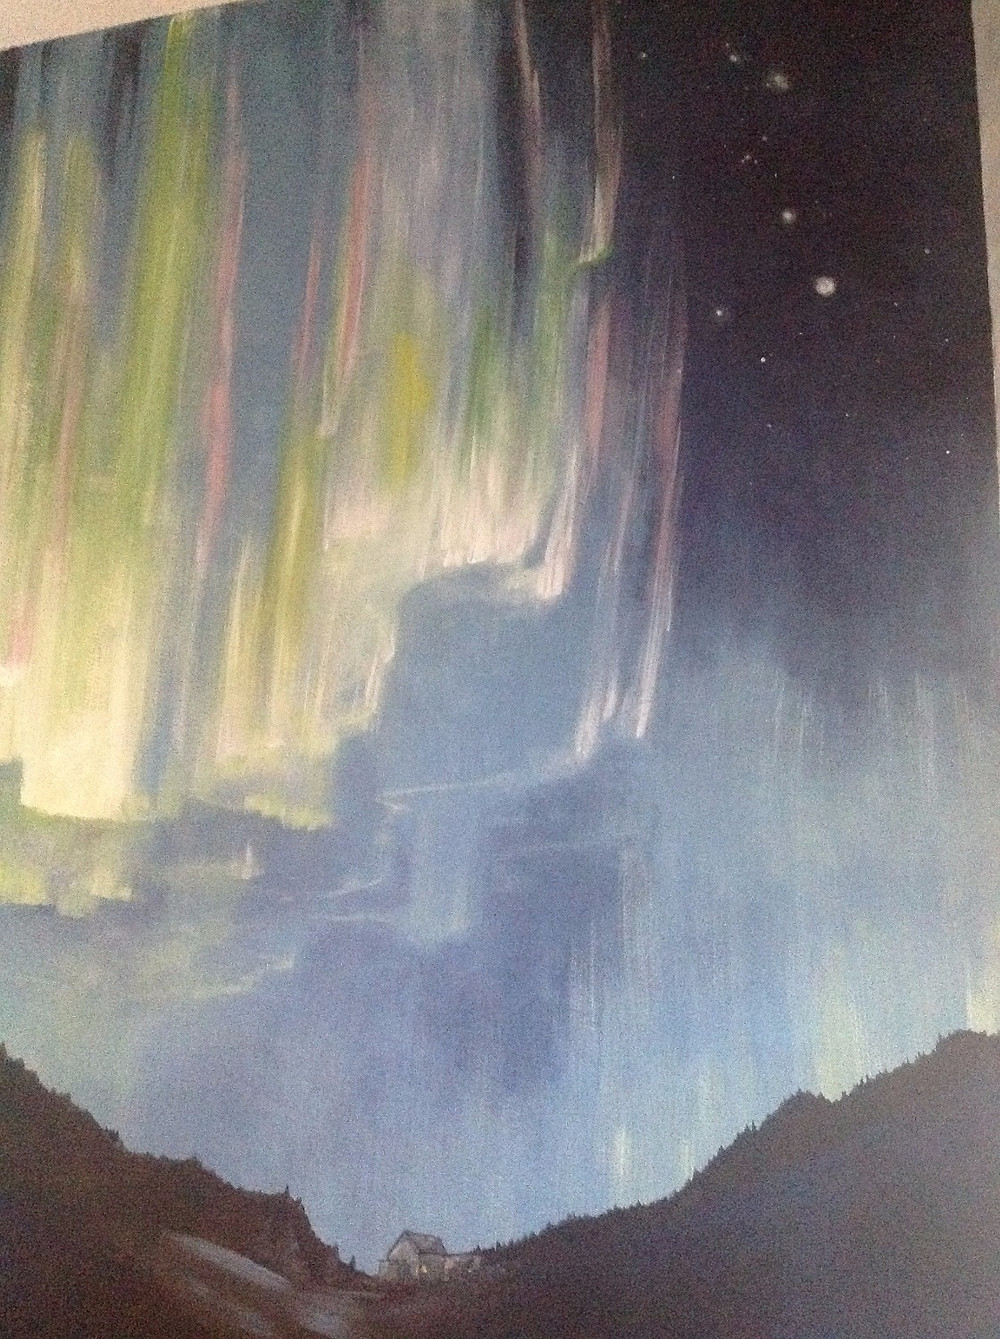 Aurora Borealis mural for a home sick Alaskan